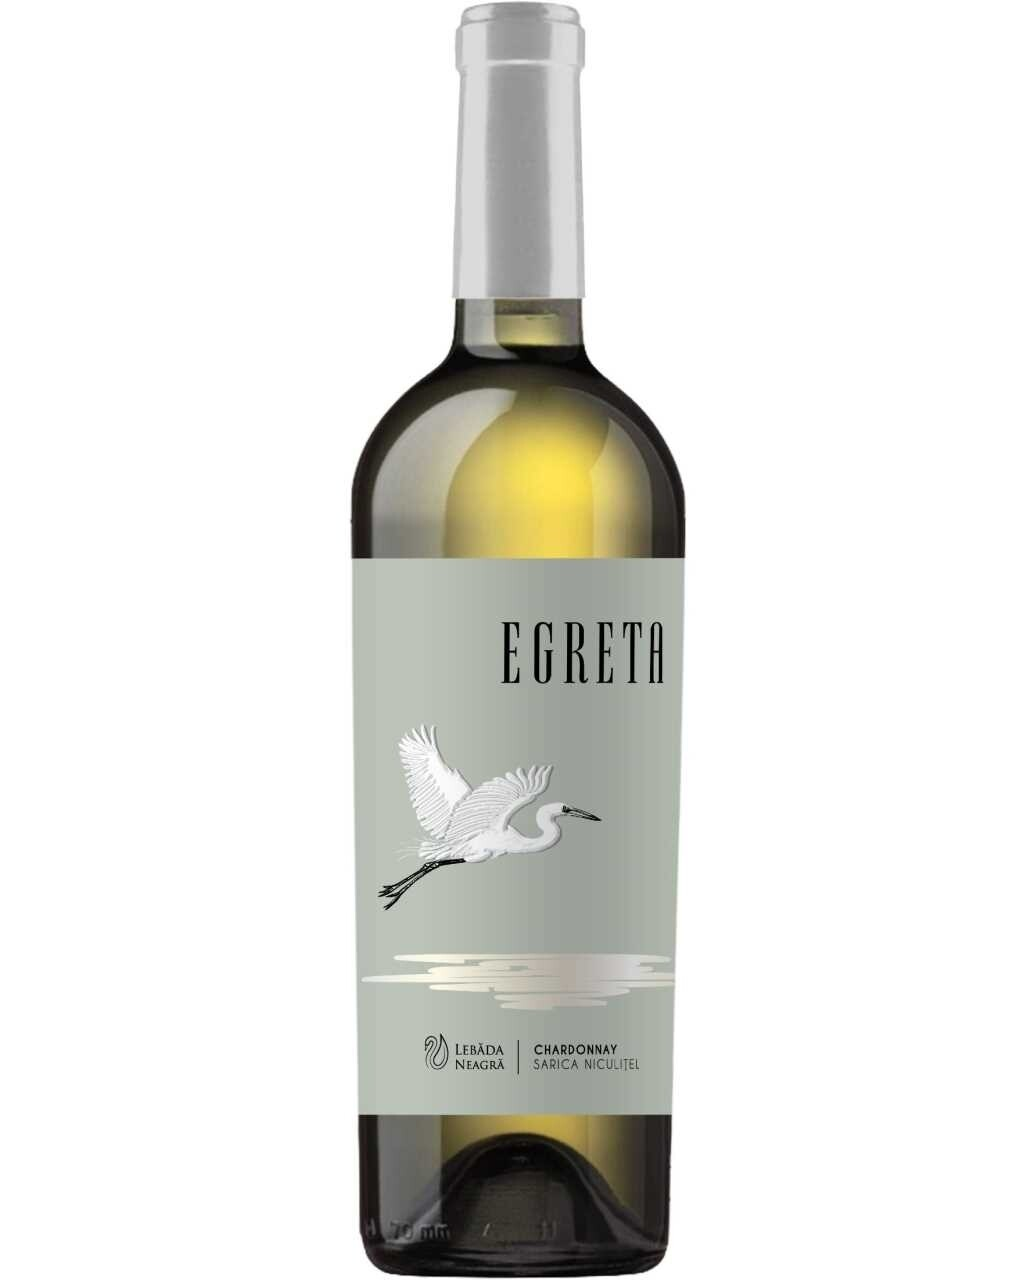 Lebada Neagra Egreta Chardonnay Demisec